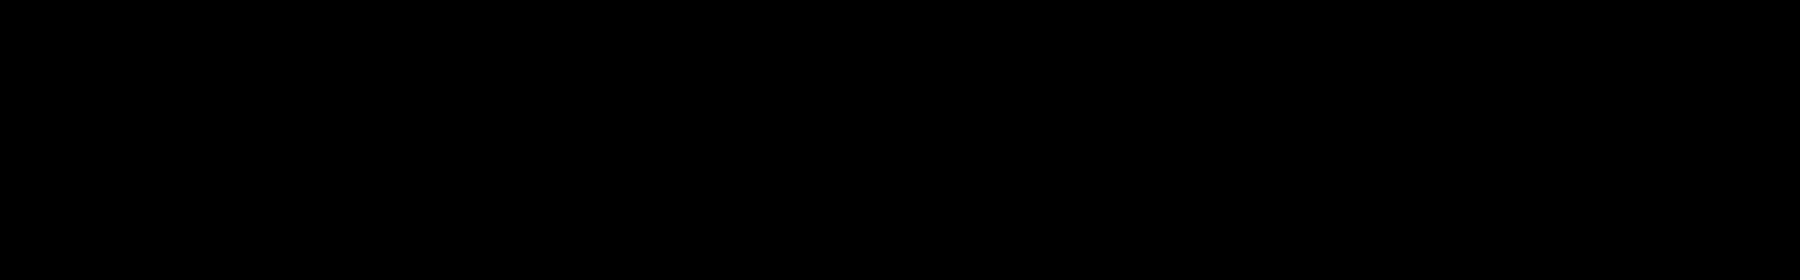 M3TRO PART 3 audio waveform